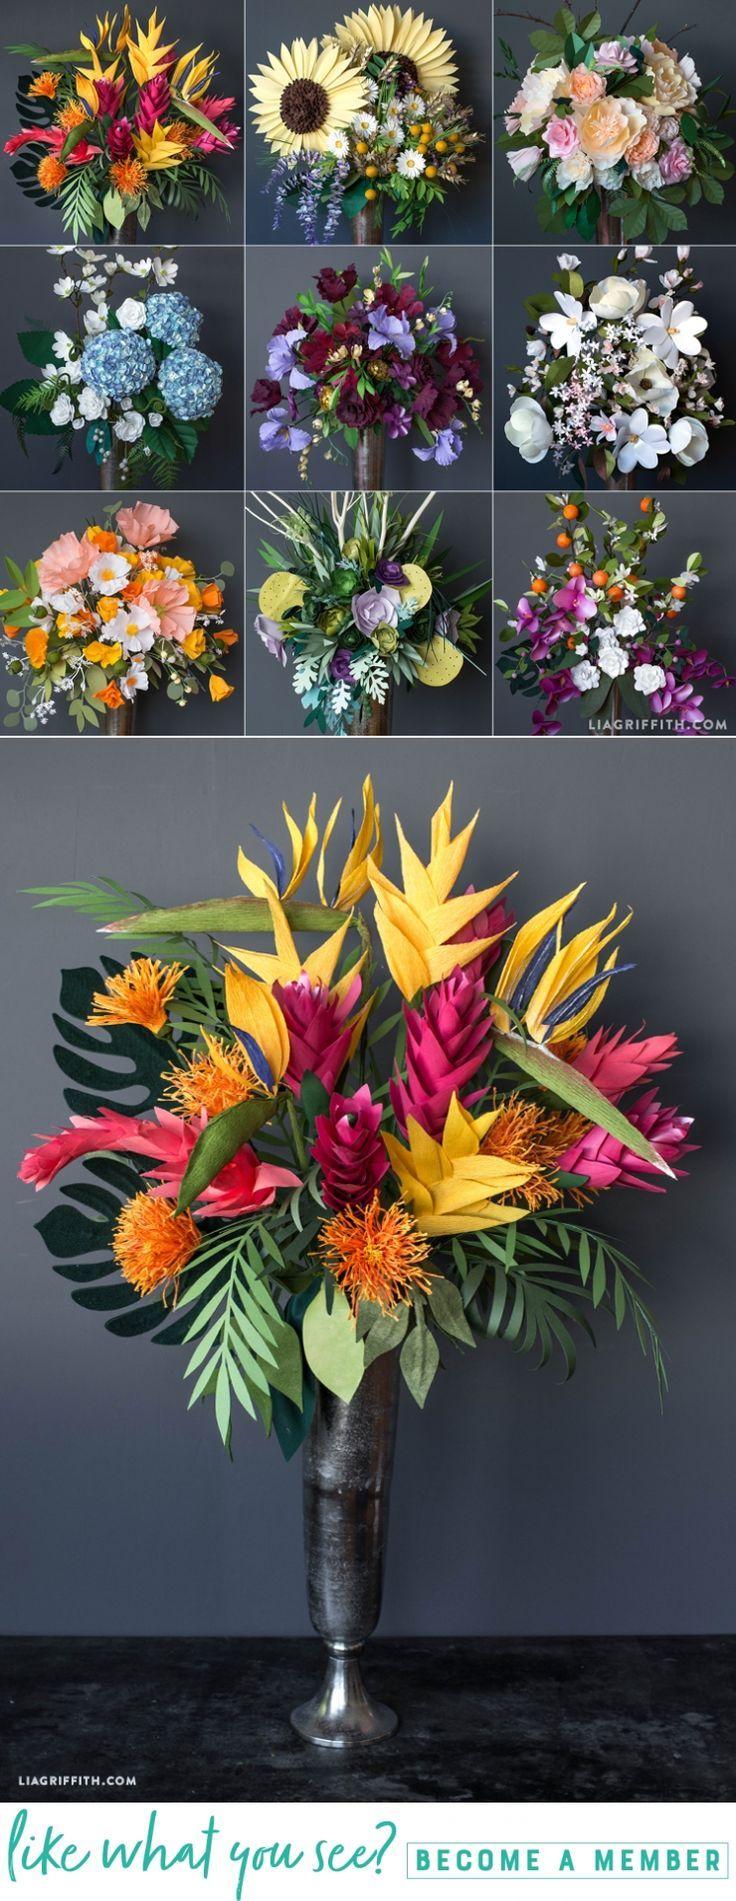 Giant Paper Flower Bouquets for Cricut #giantpaperflowers